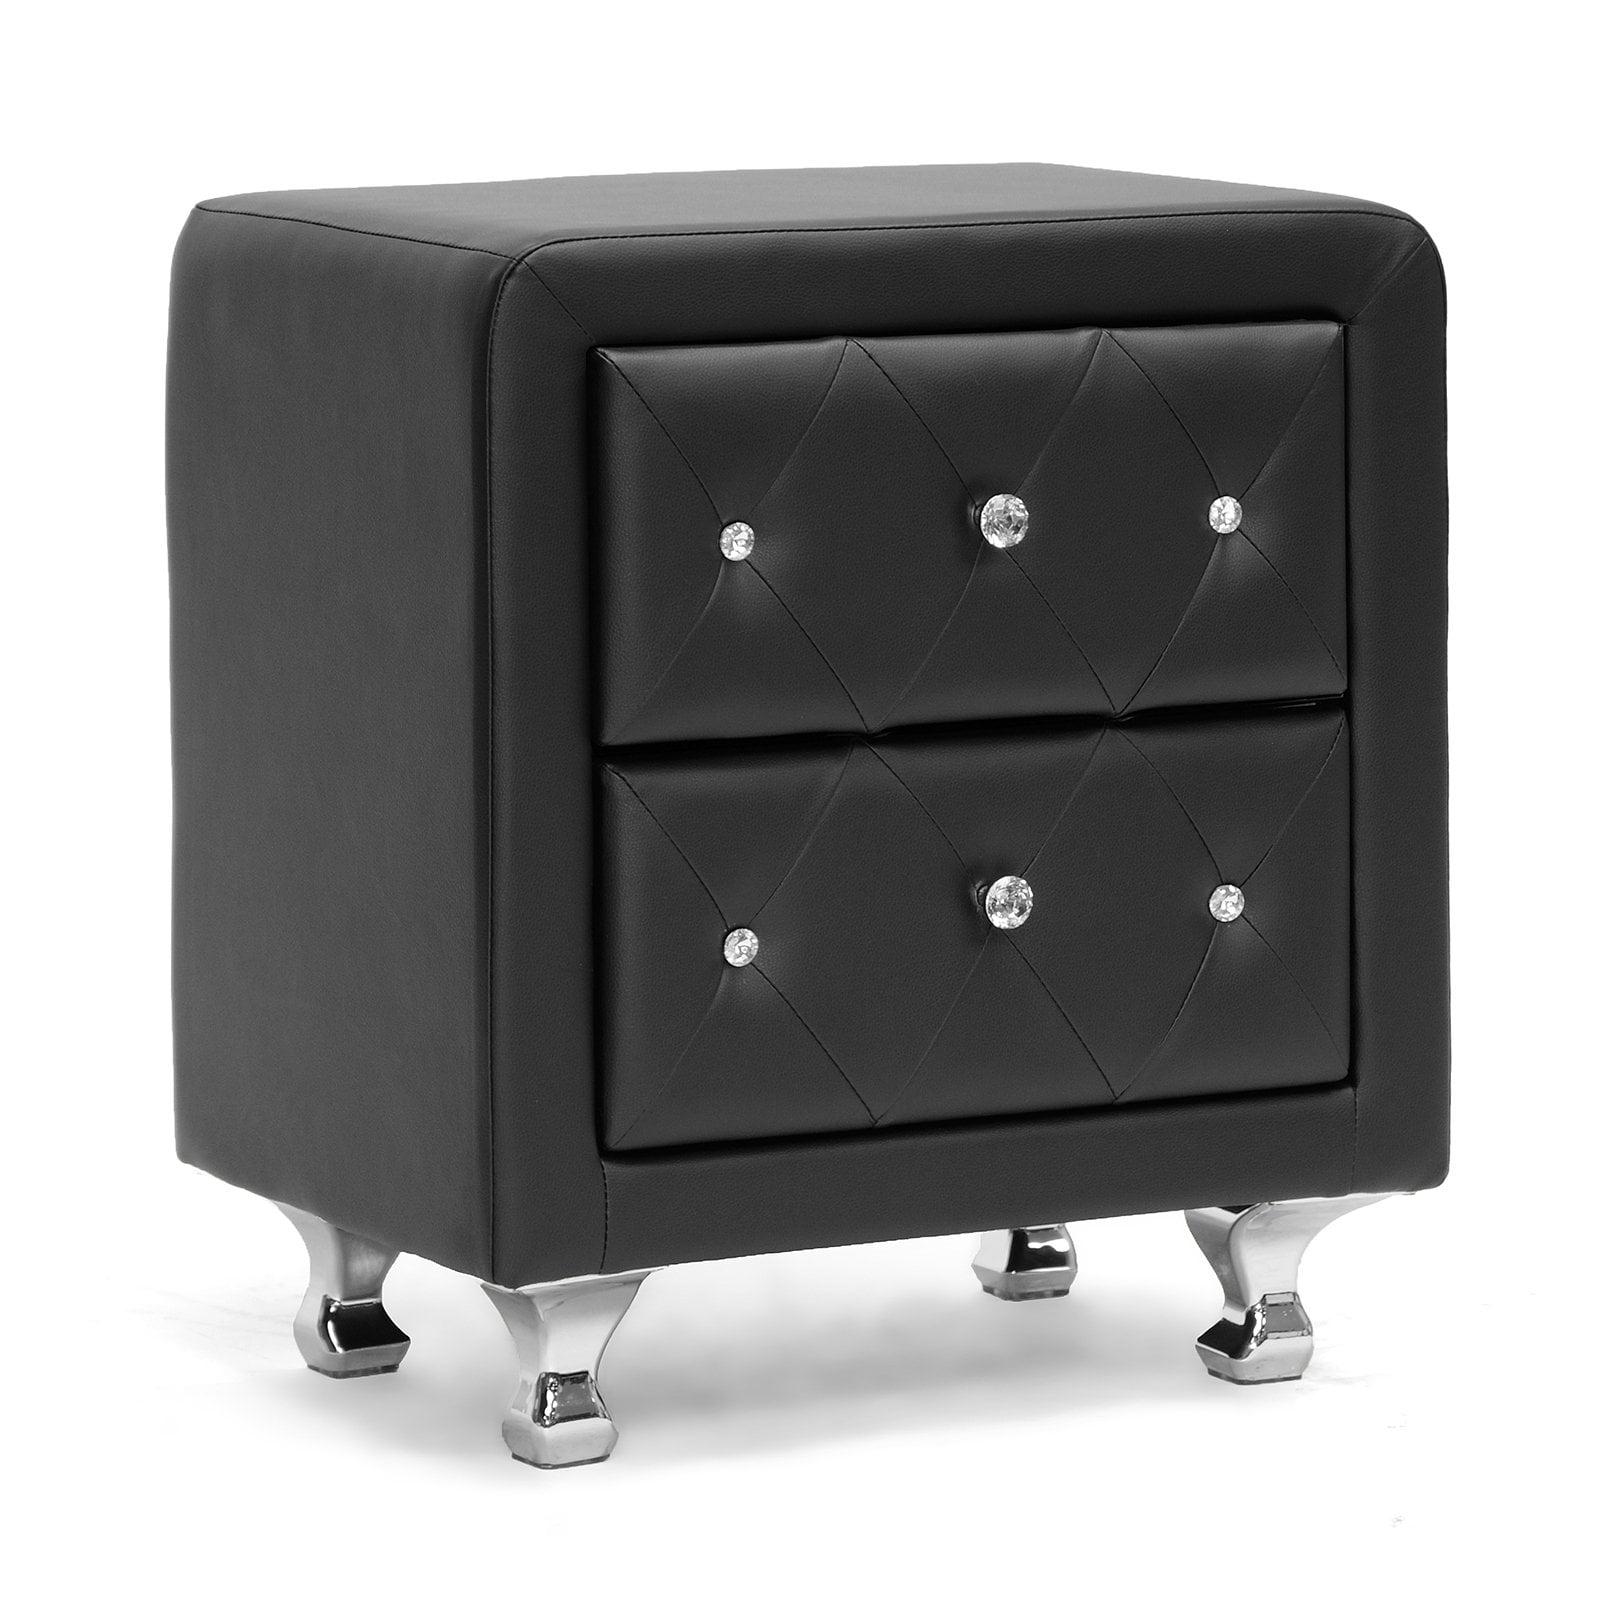 Baxton Studio Stella Crystal Tufted Upholstered Modern Nightstand